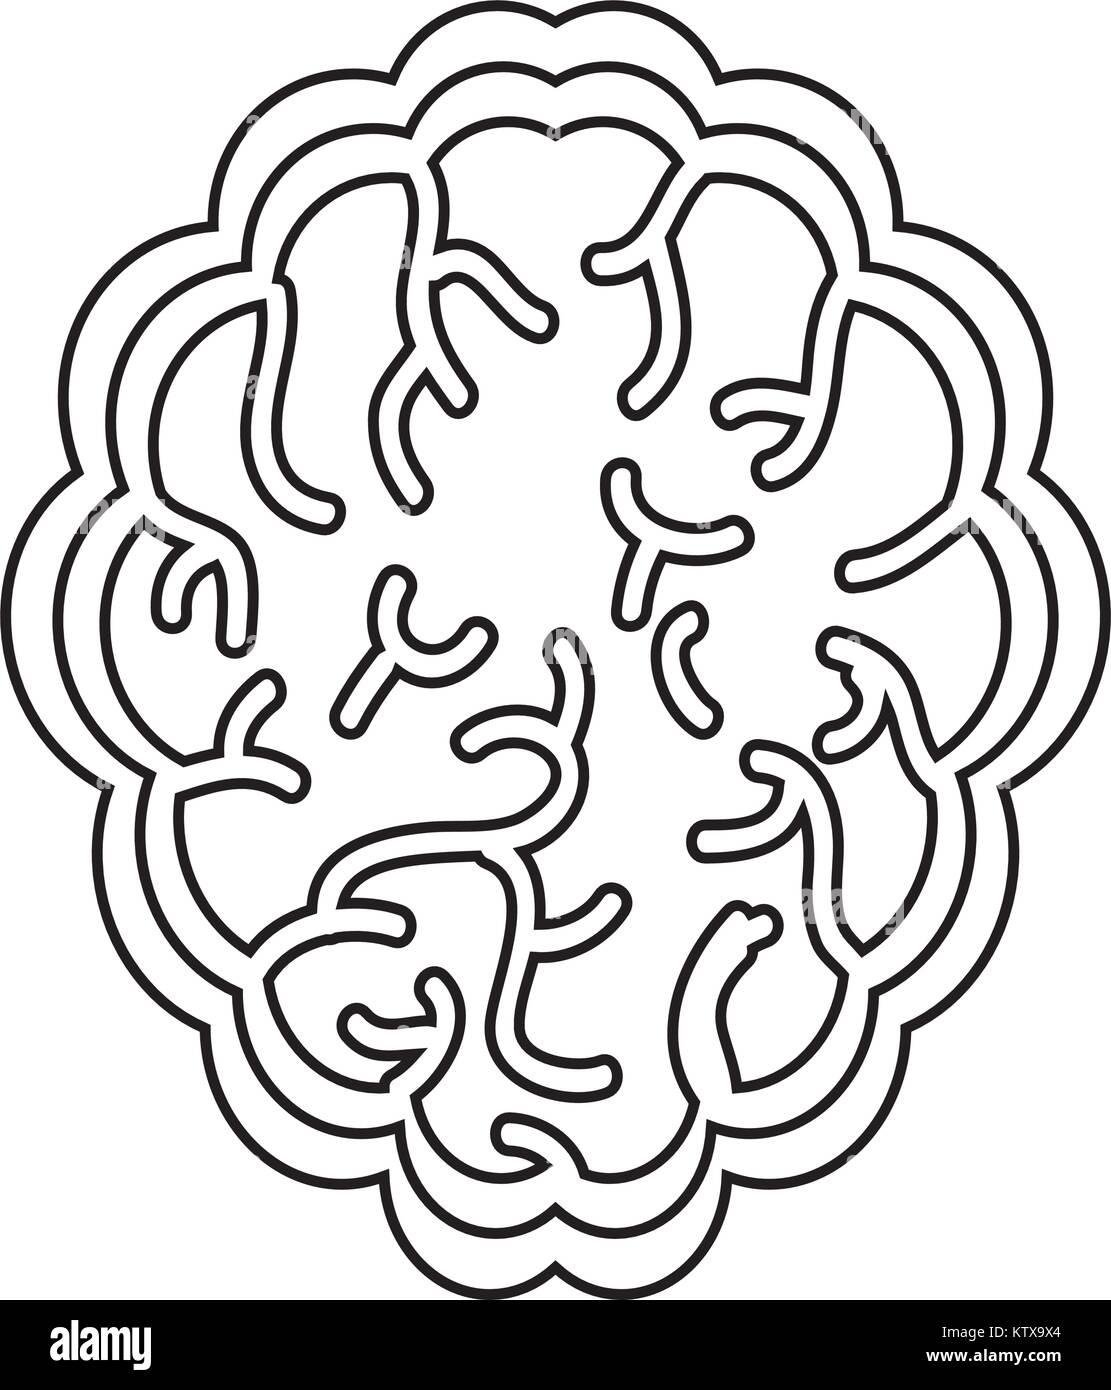 brain organ icon - Stock Image